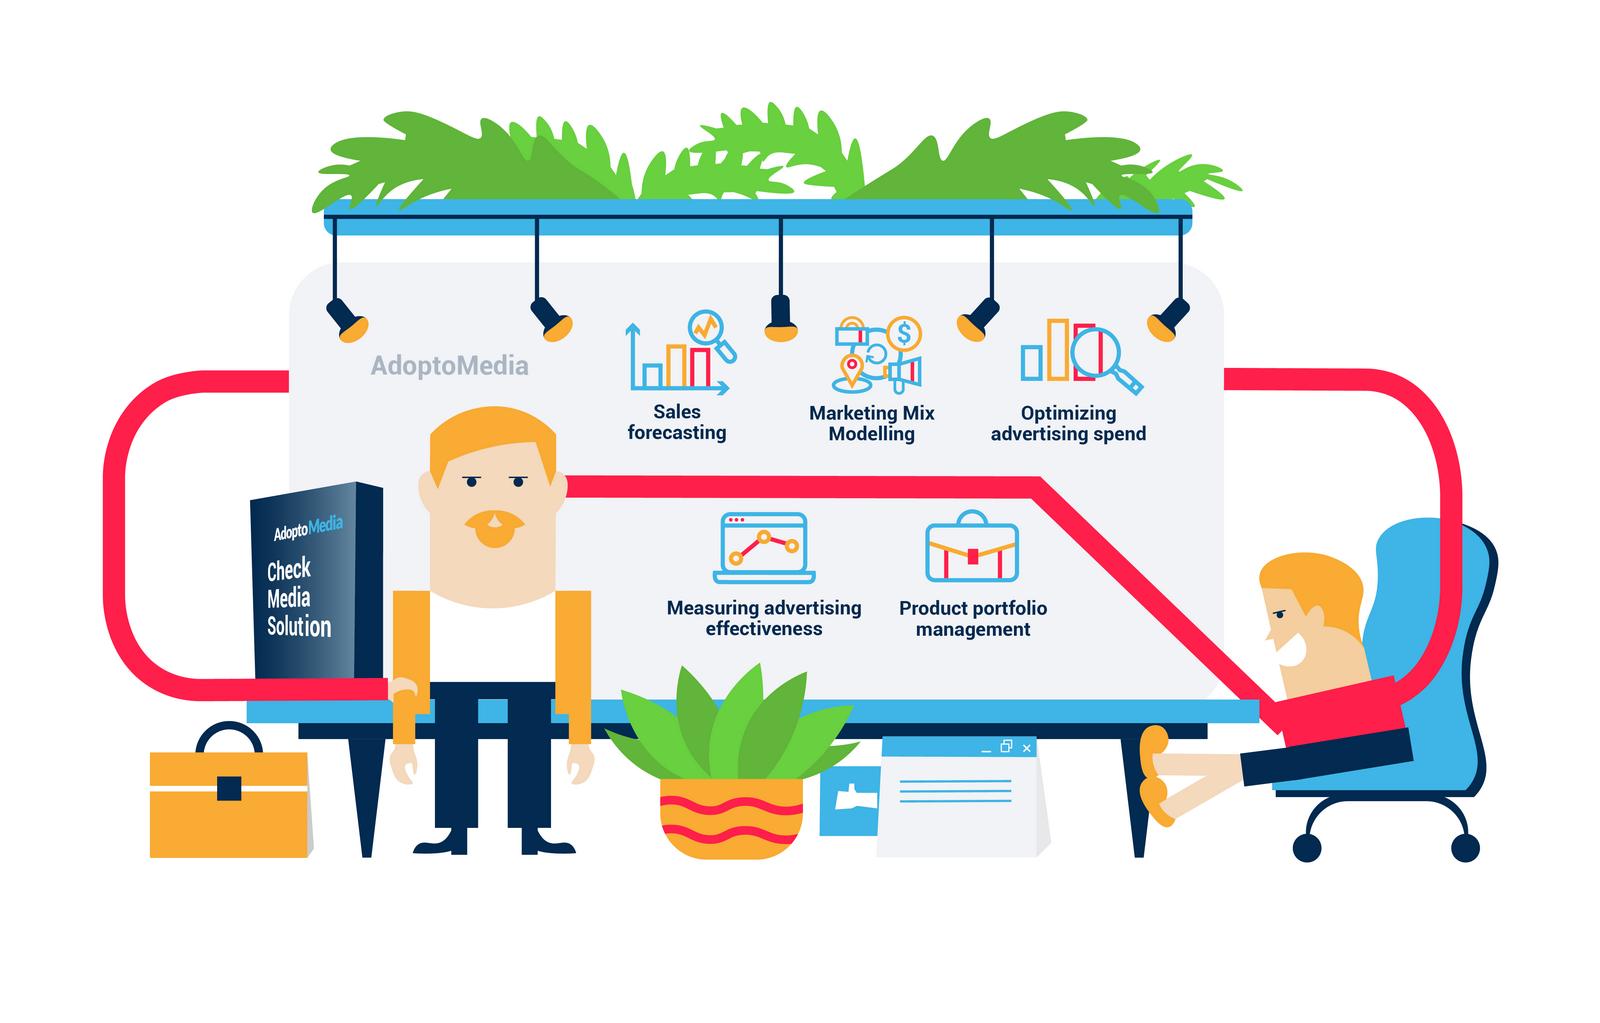 Marketing Mix Modelling, Marketing Technology, ROMI optimization, ROMI increase, marketing budget optimization, effective marketing strategy, CheckMedia Solution, AdoptoMedia, forecast sales, measure advertising effectiveness